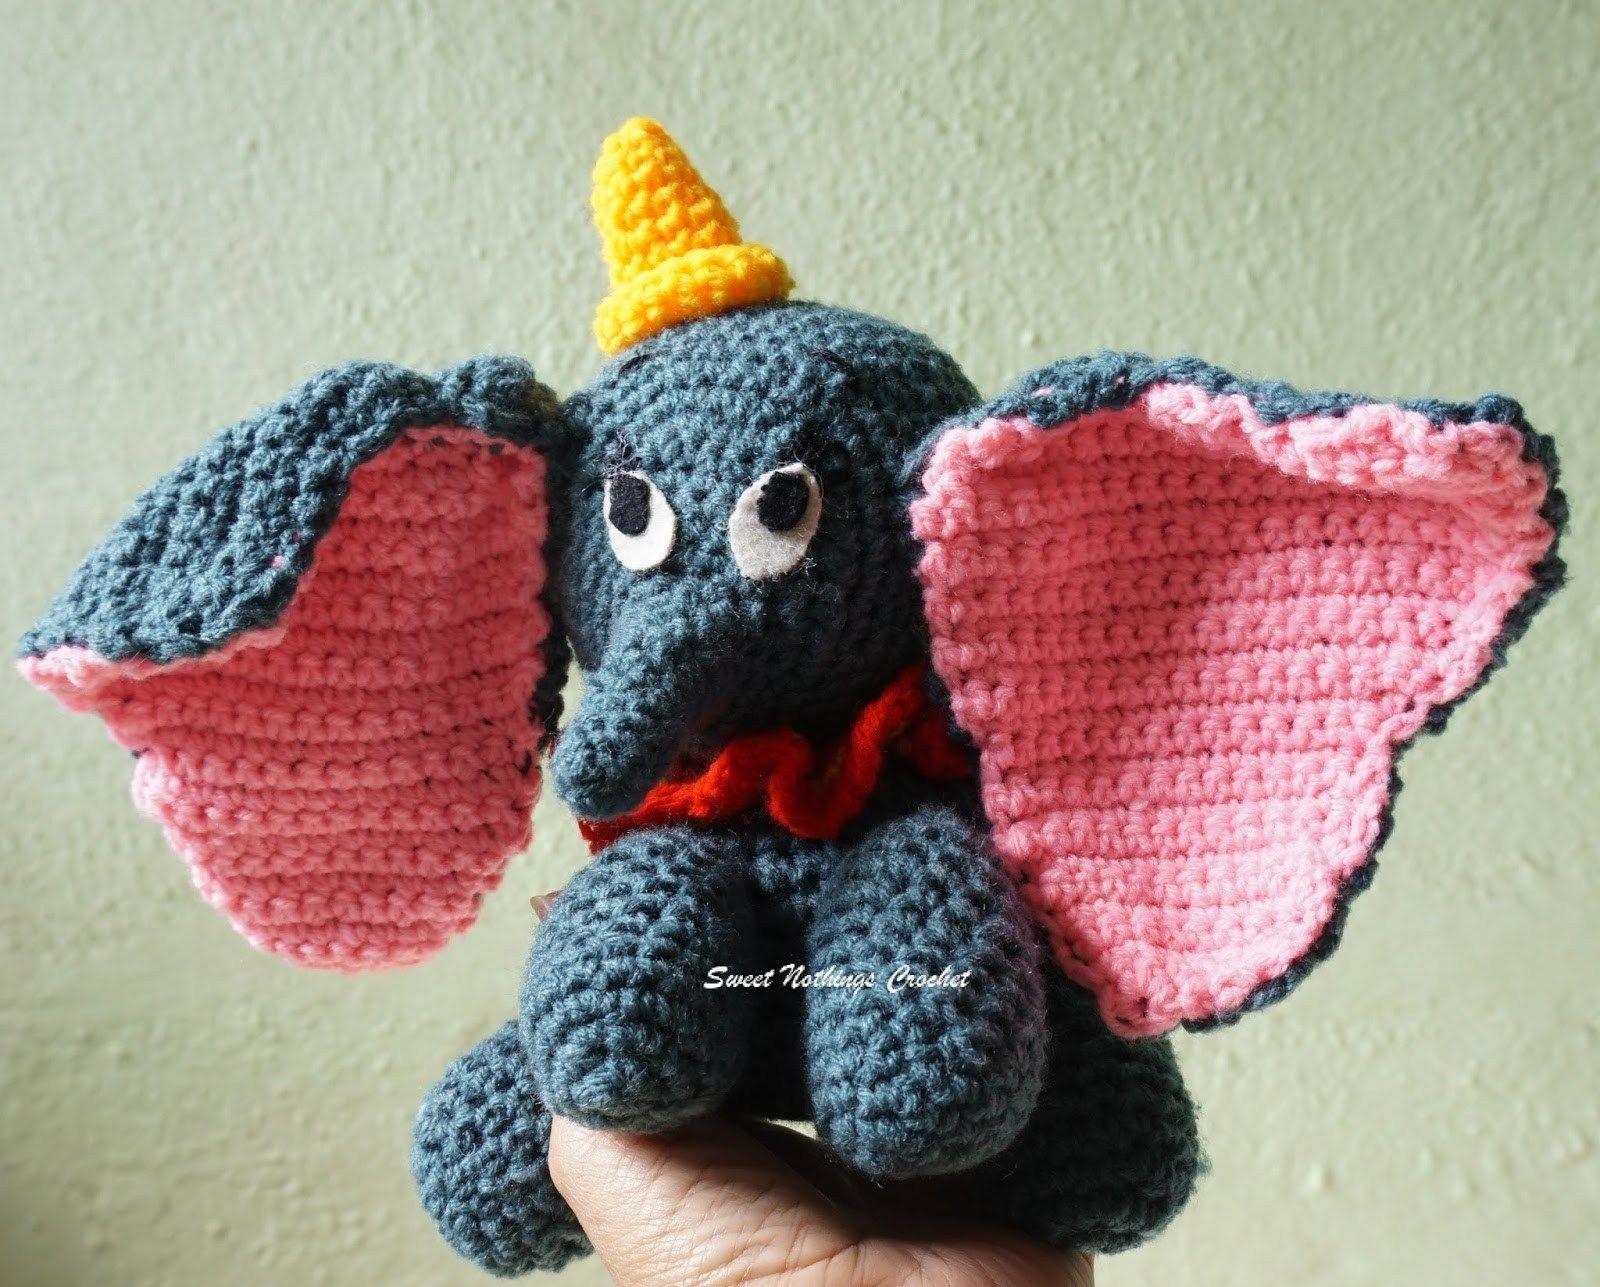 35+ Inspired Image of Free Crochet Elephant Pattern